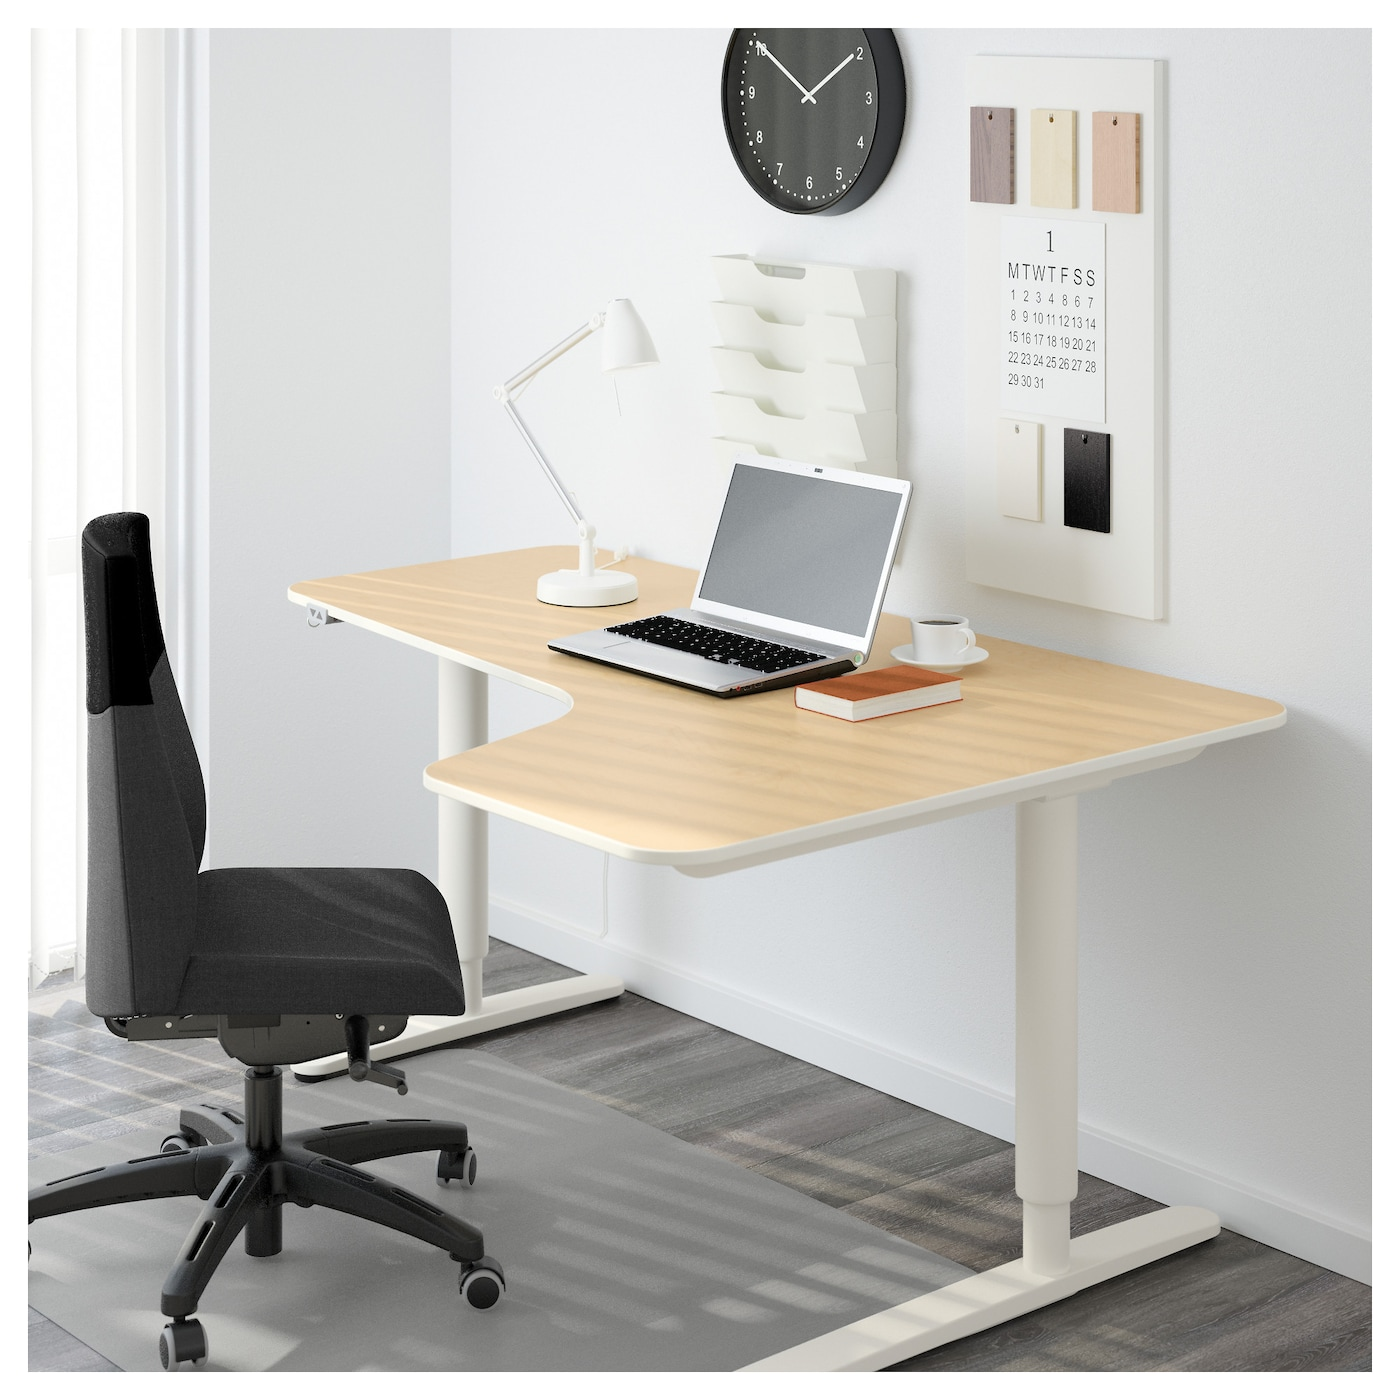 ikea adils desks ideas for office home desk setup corner linnmon